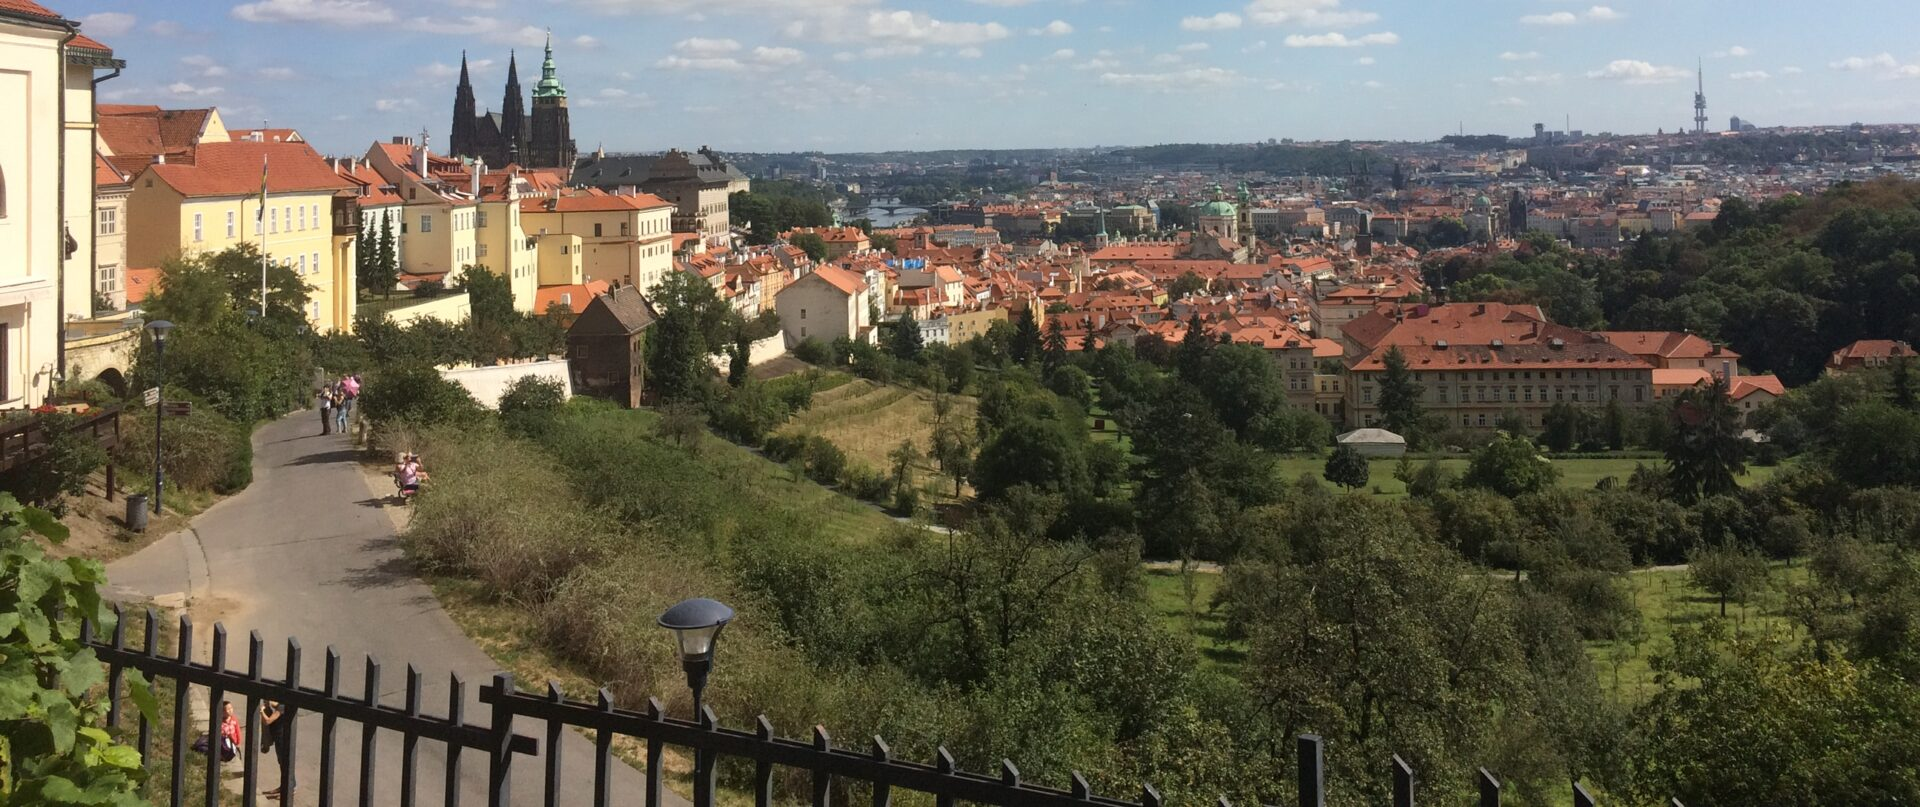 reisblogs oost europa Praag1